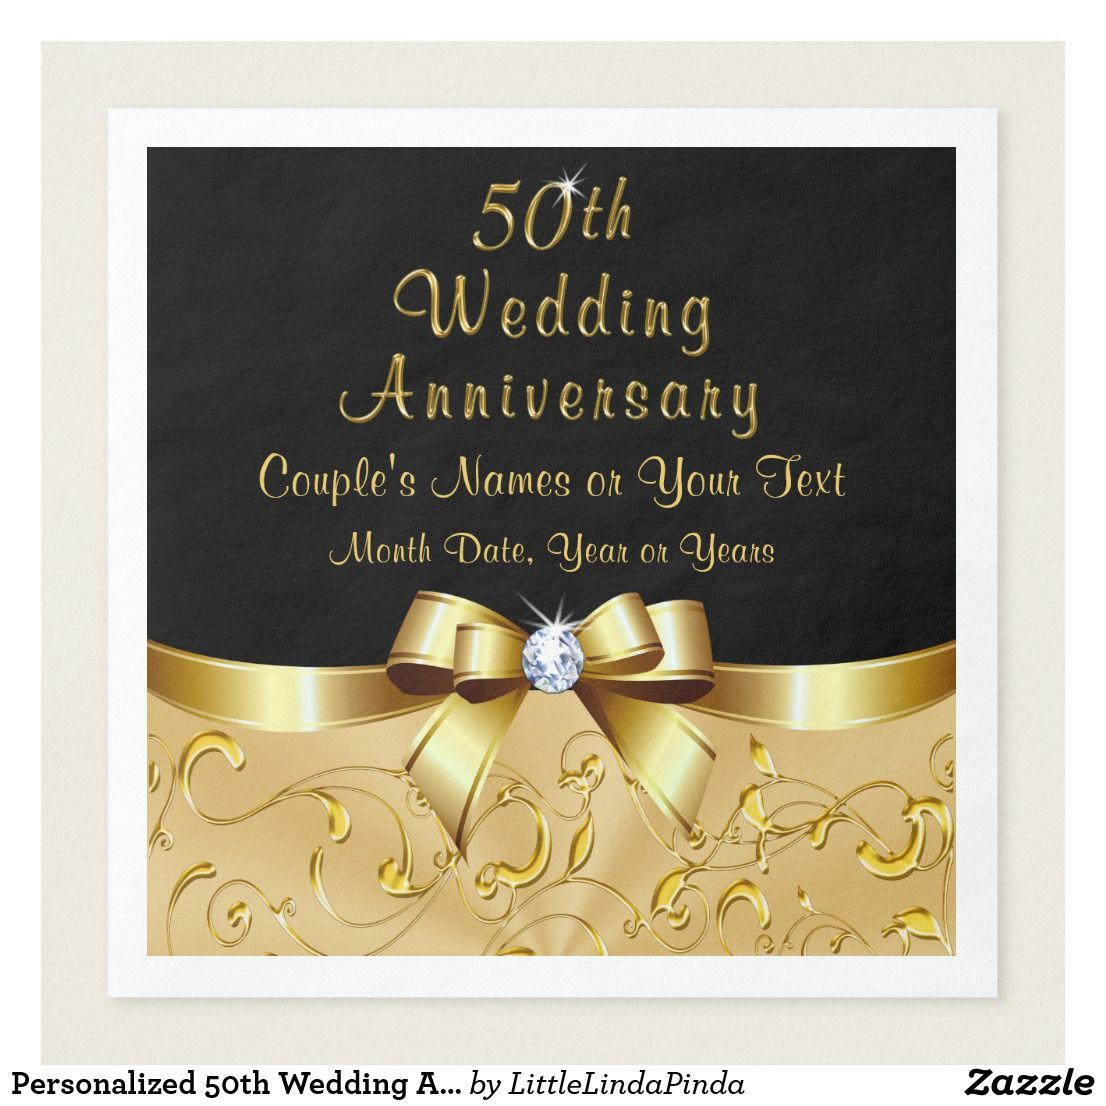 Personalized 50th Wedding Anniversary Napkins